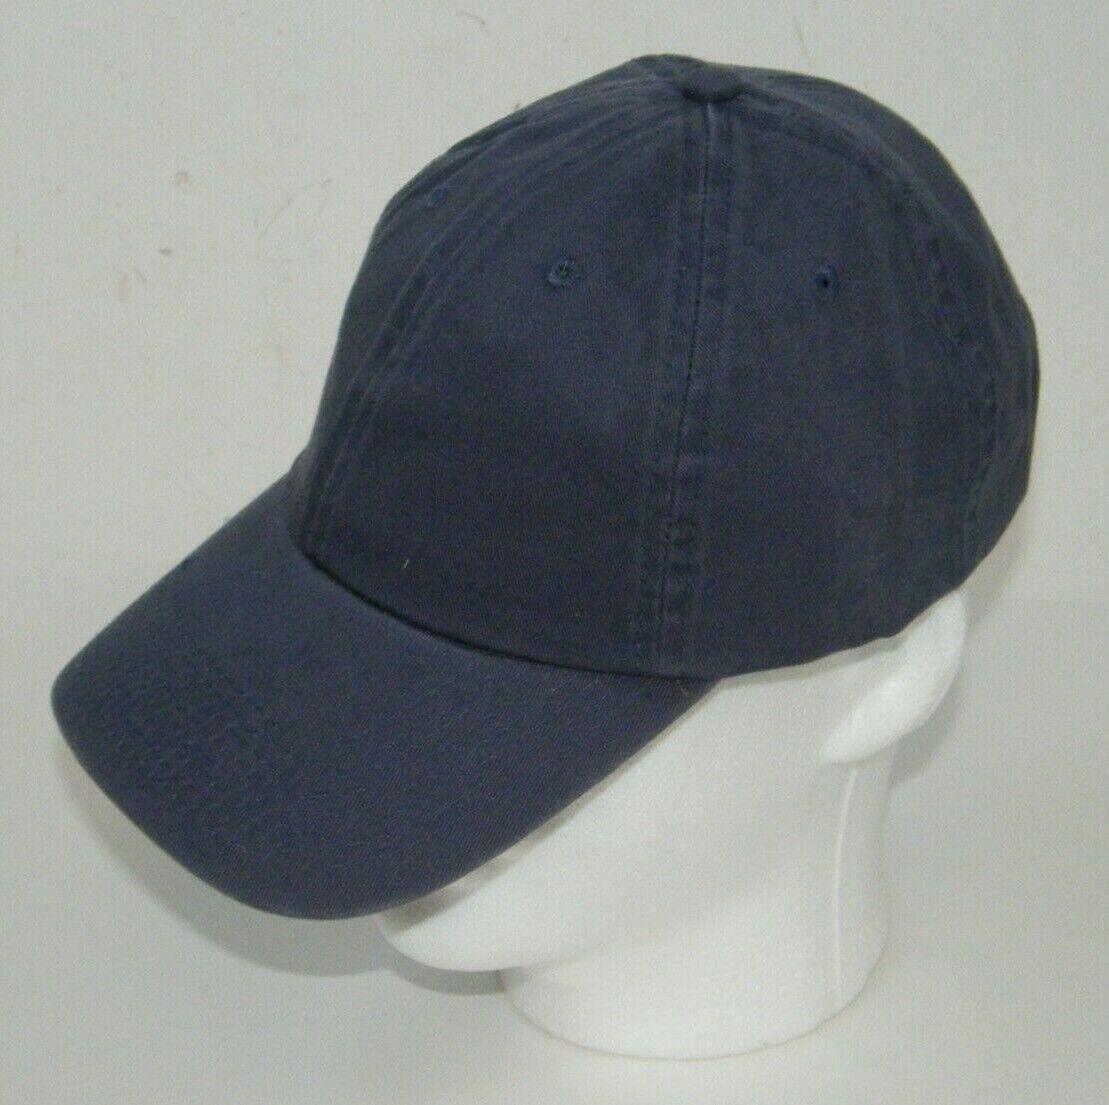 (7) FAHRENHEIT HEADWEAR 508 CAPS / HATS GARMENT WASHED BLUE BUCKLE BACK